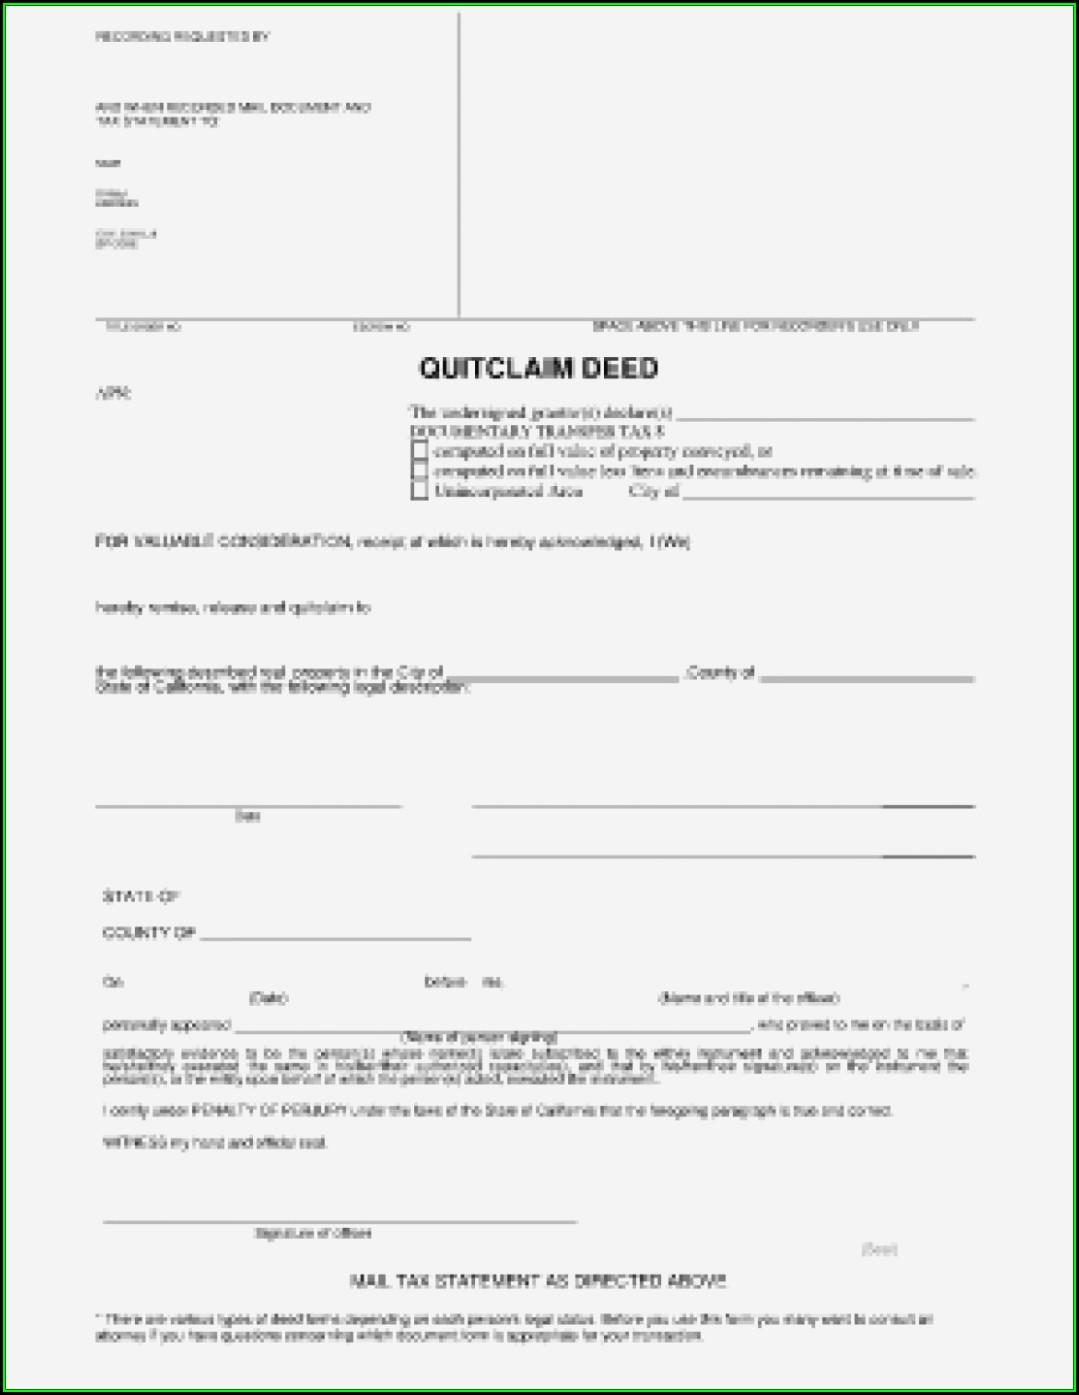 Blank Quit Claim Deed Form California